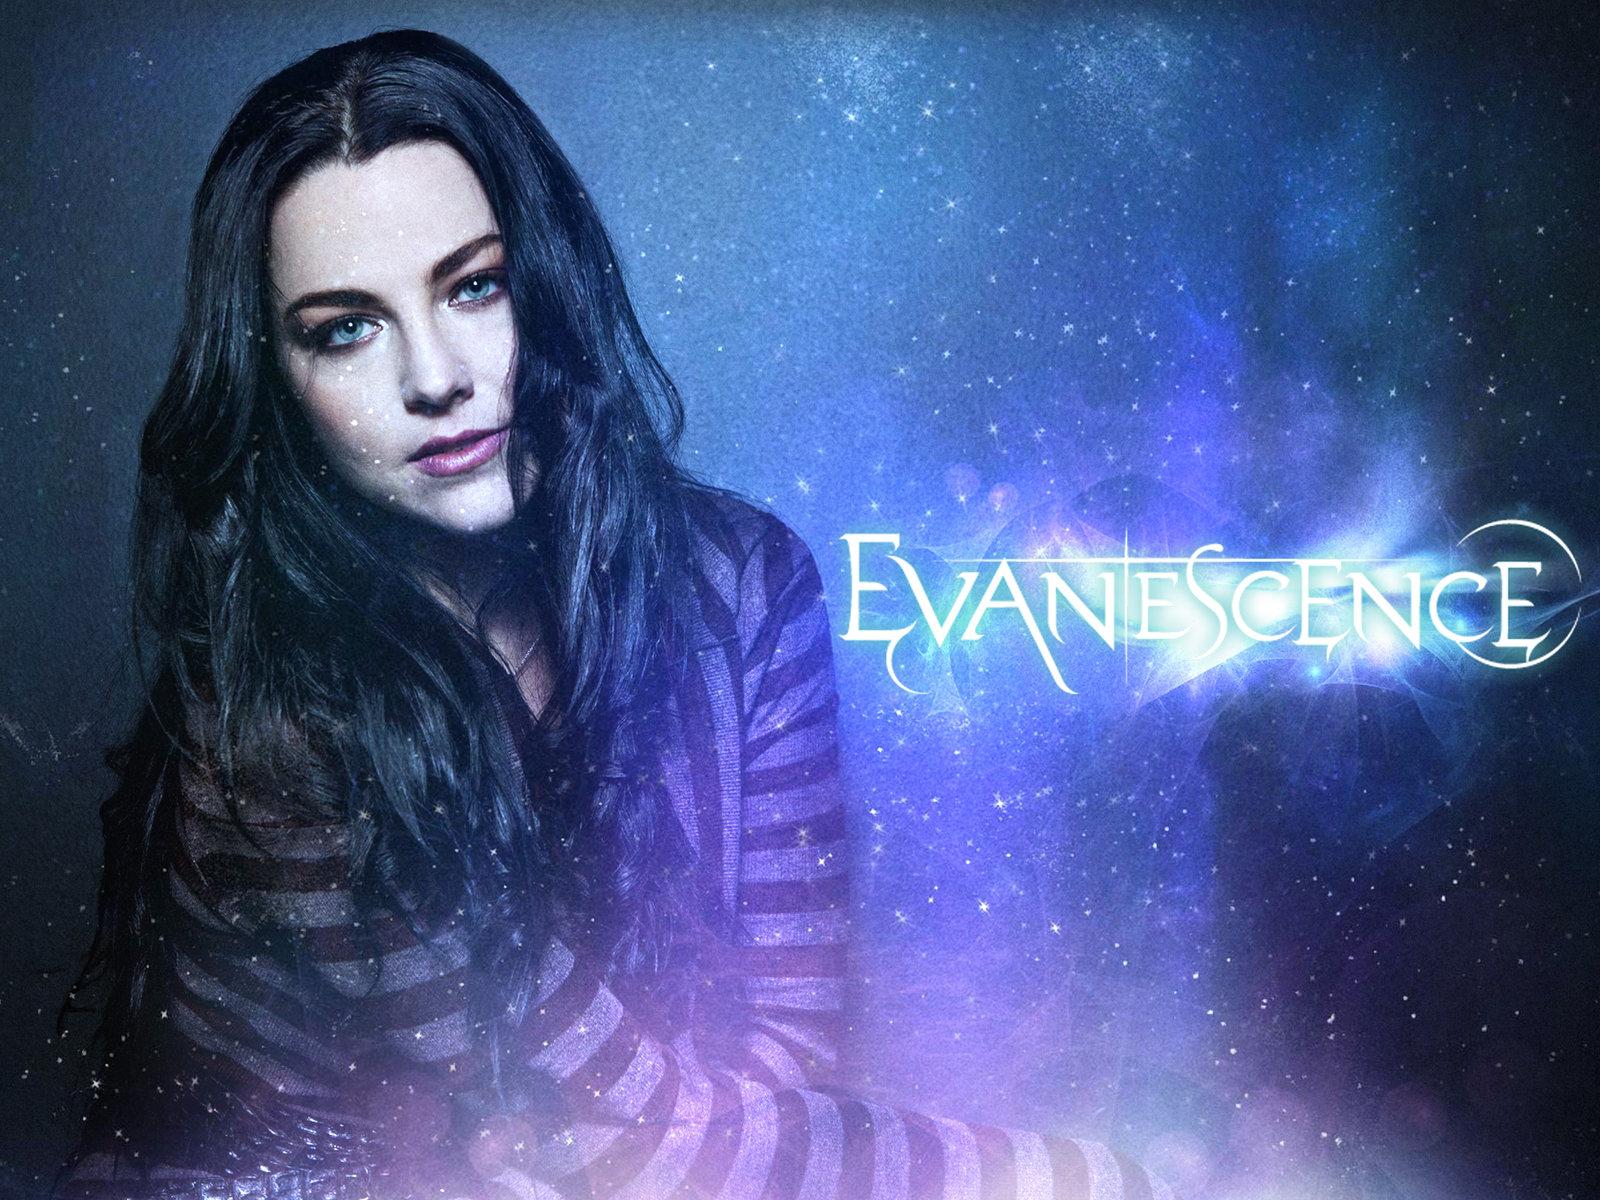 Evanescence   Evanescence Wallpaper 30515076 1600x1200